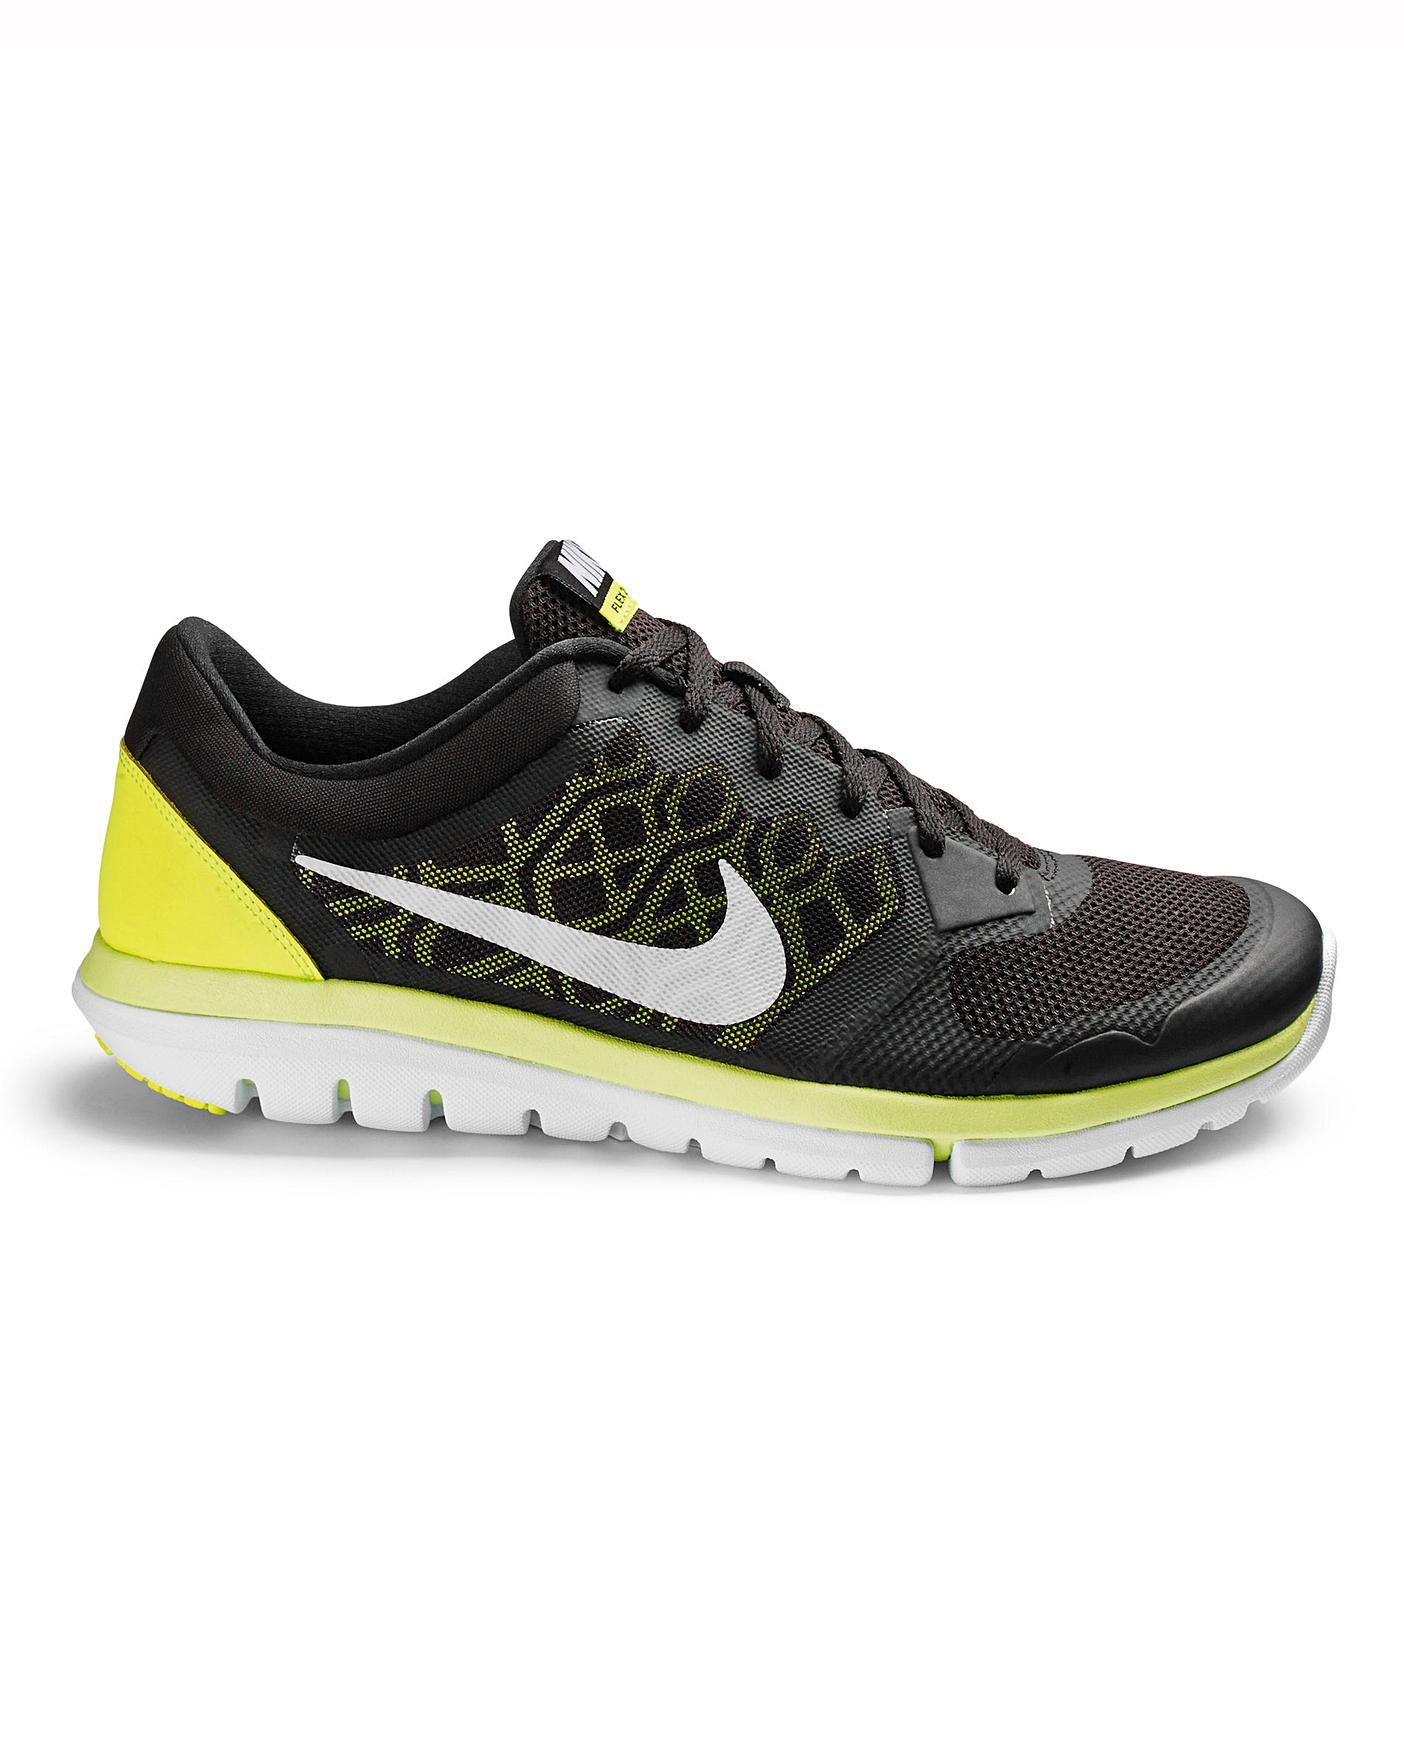 grossiste 2a345 64b43 Nike Flex 2015 Run Trainers